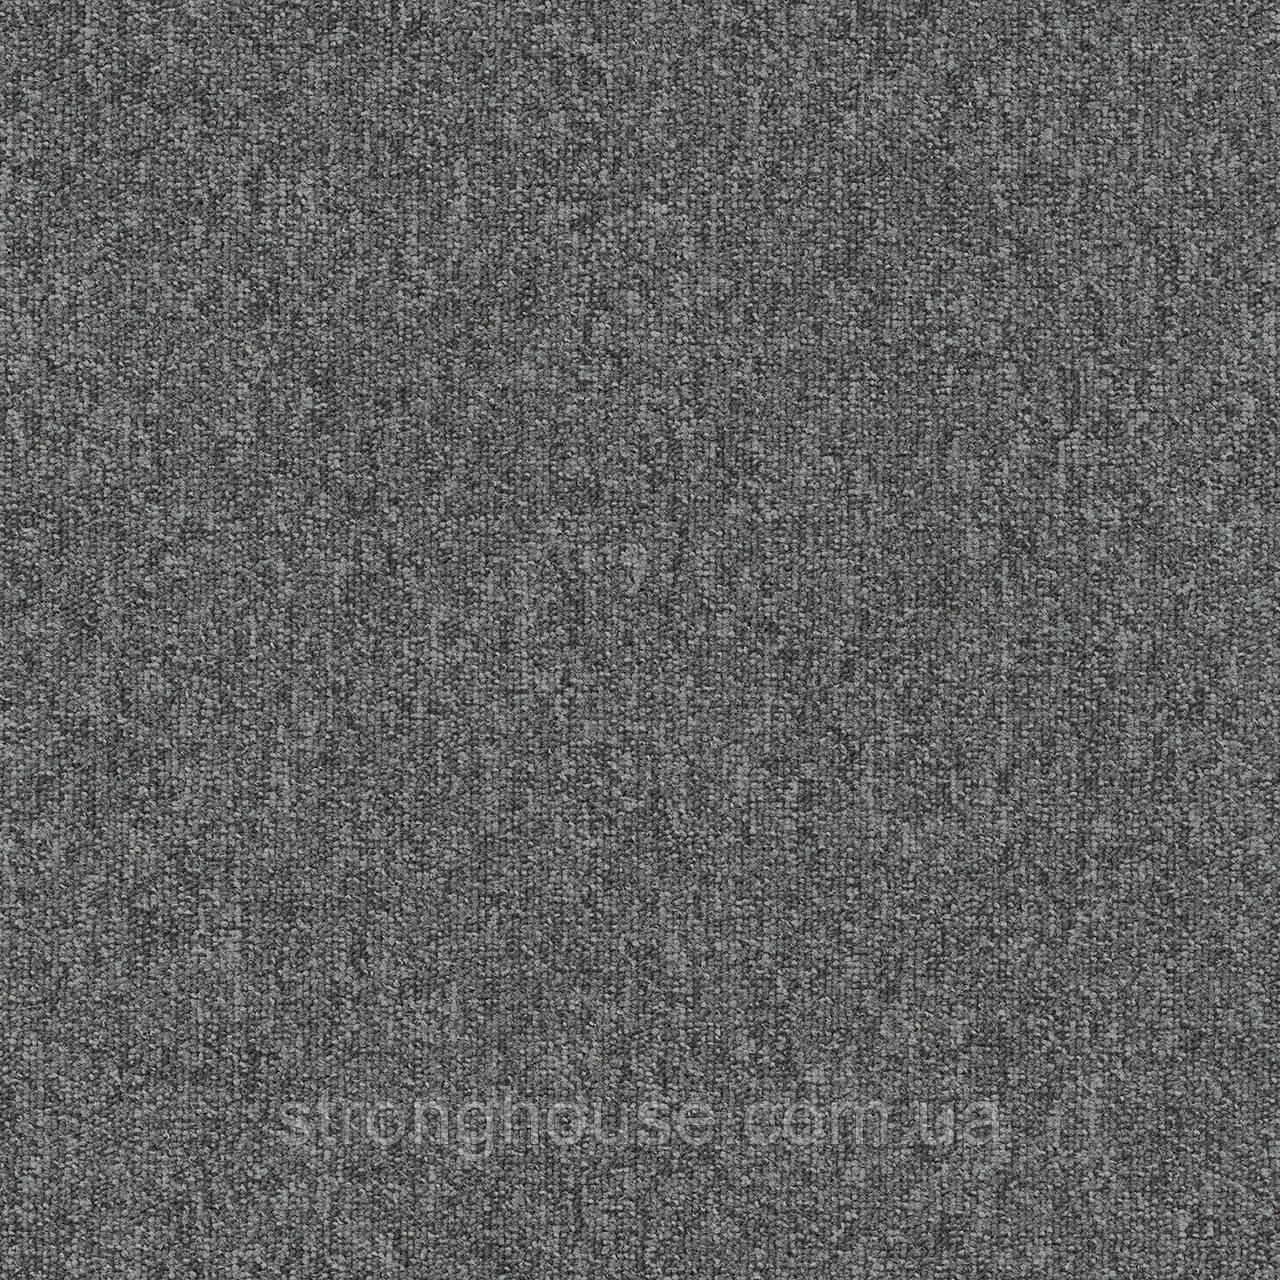 Domo Modulyss First 907 Ковровая плитка Фест 907